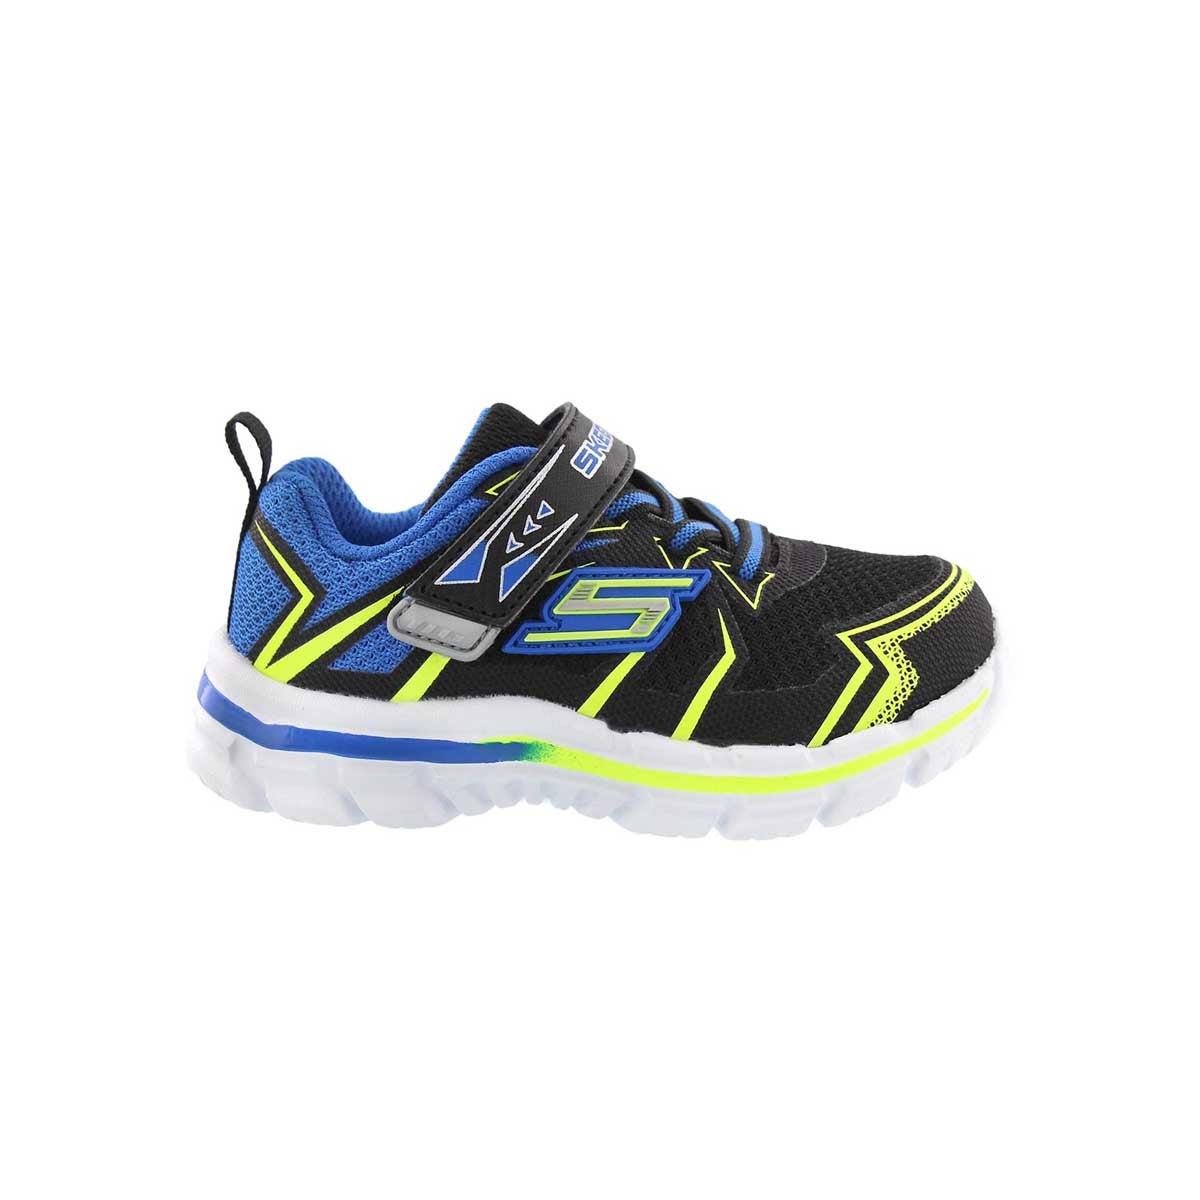 Infs-b Nitrate black/blue sneaker